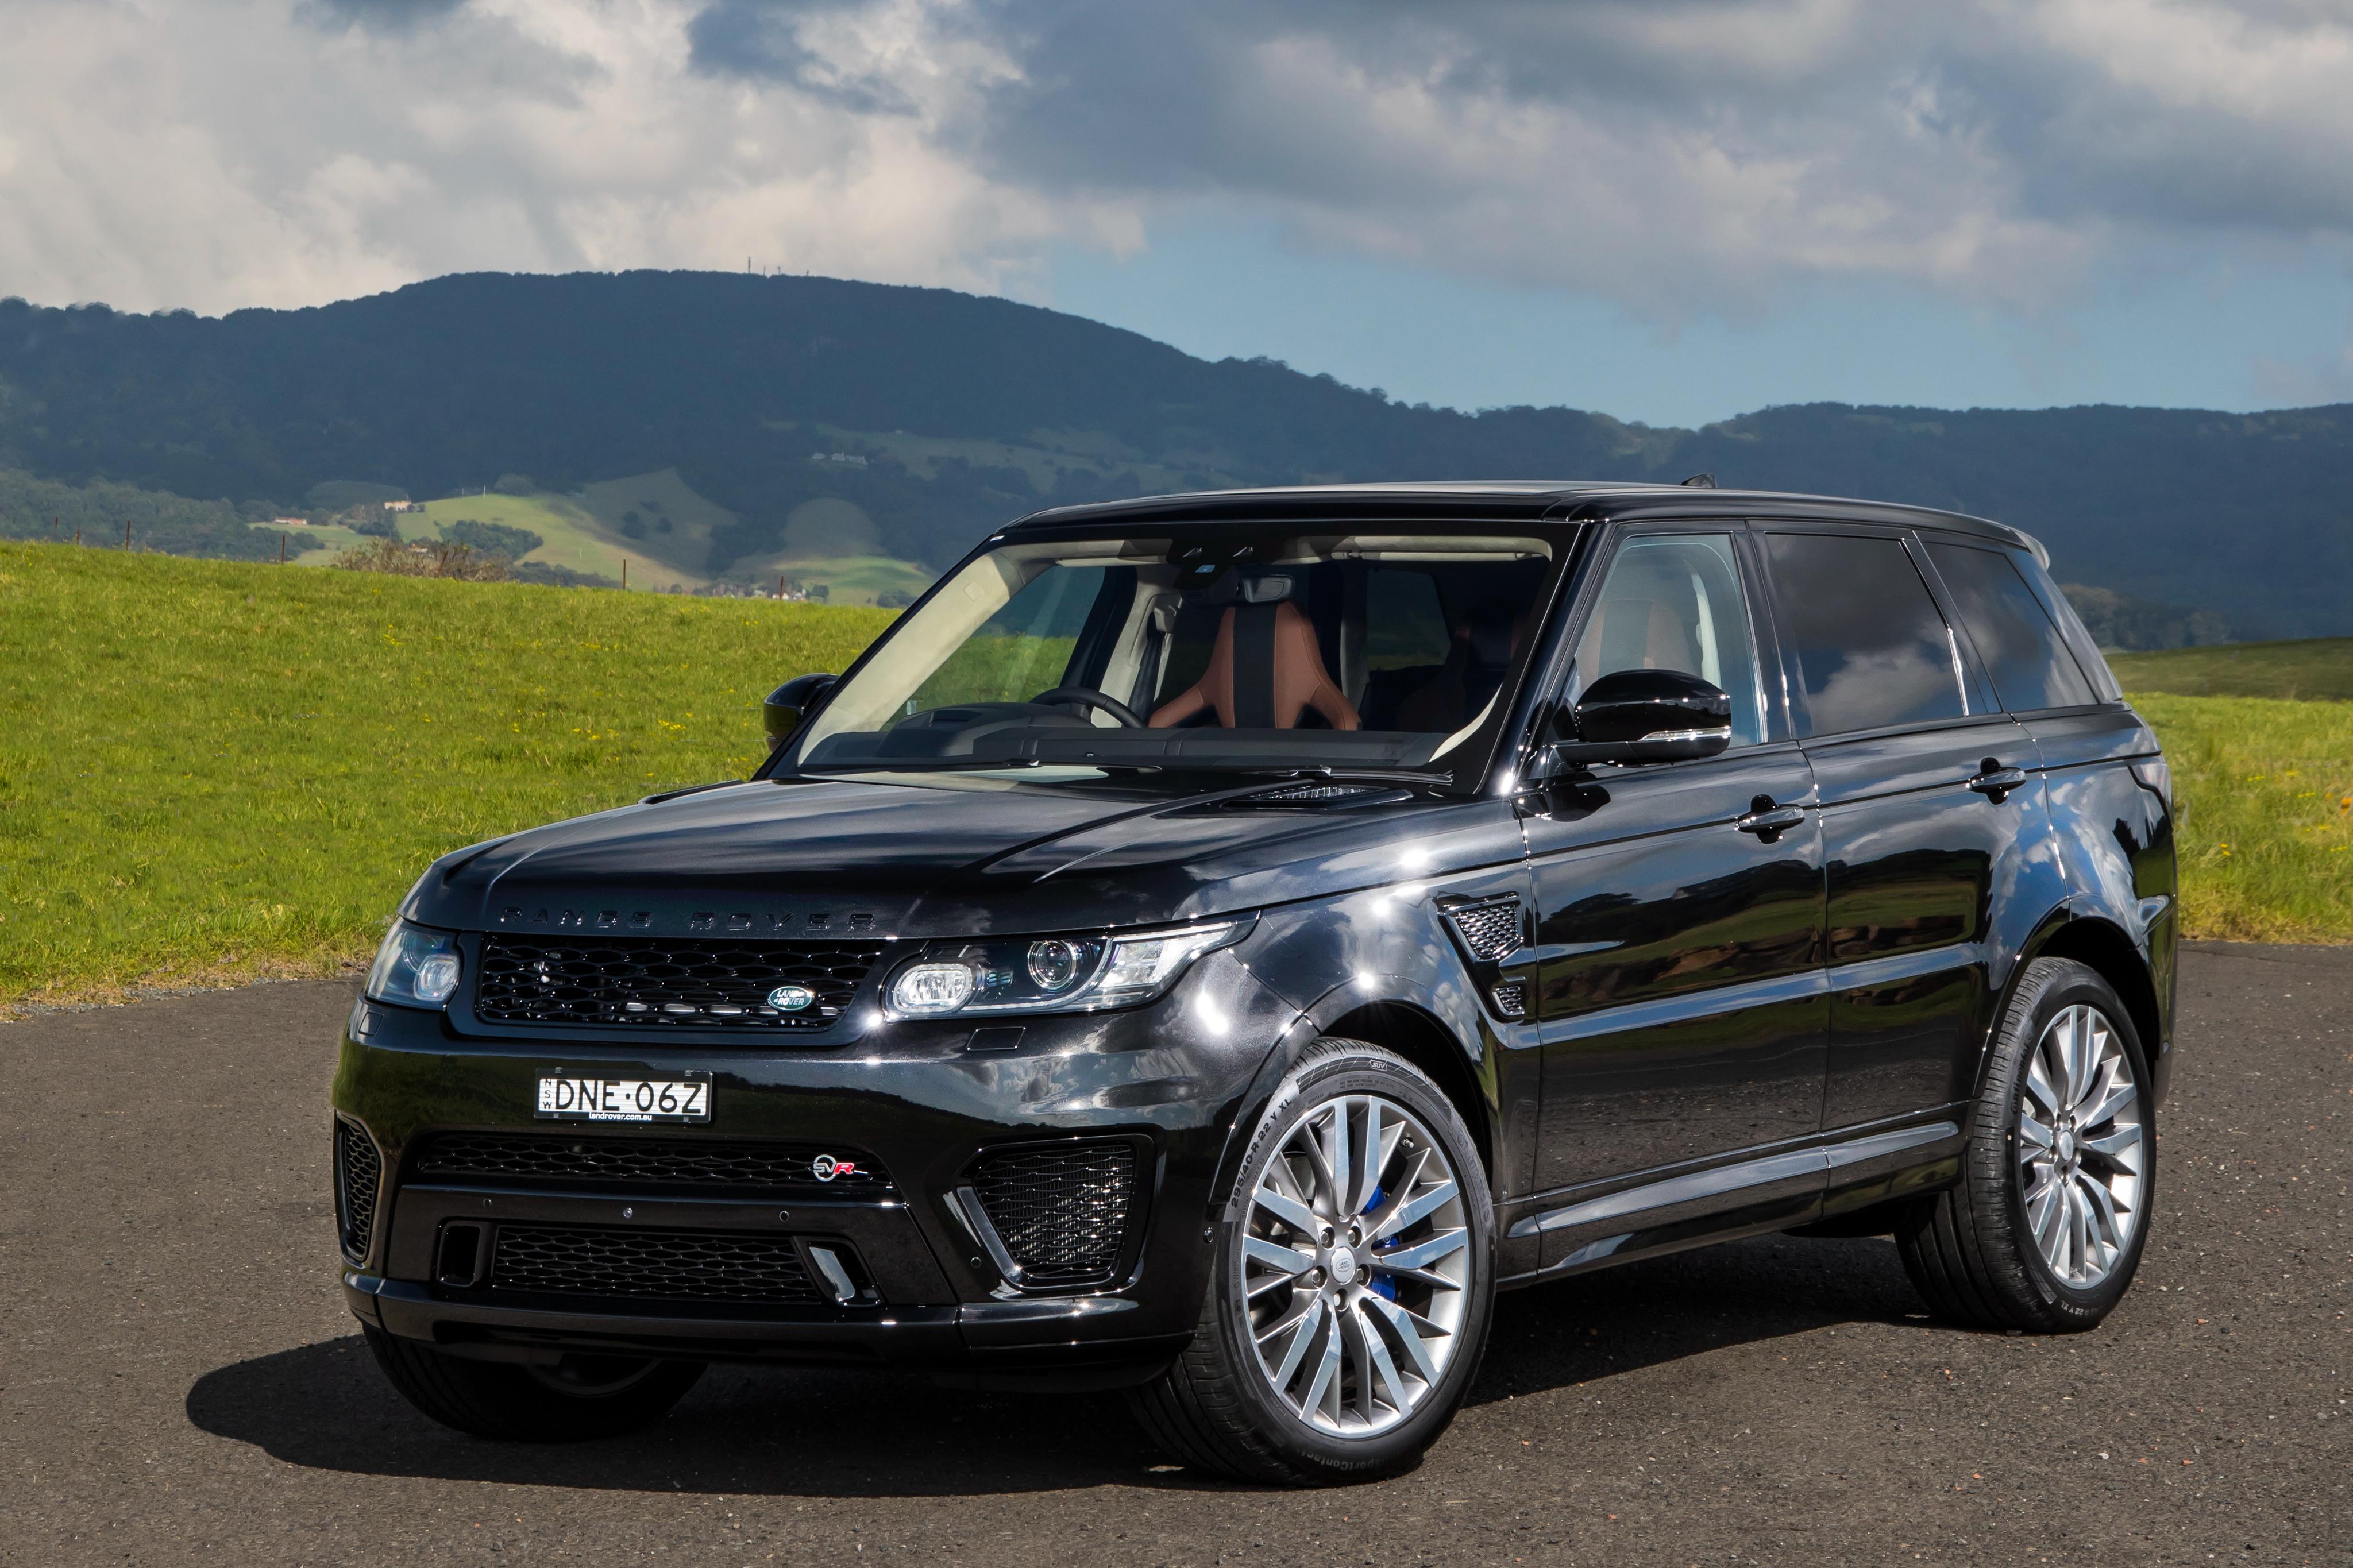 Range Rover Sport Black Wallpaper: Range Rover Sport 4k Ultra HD Wallpaper